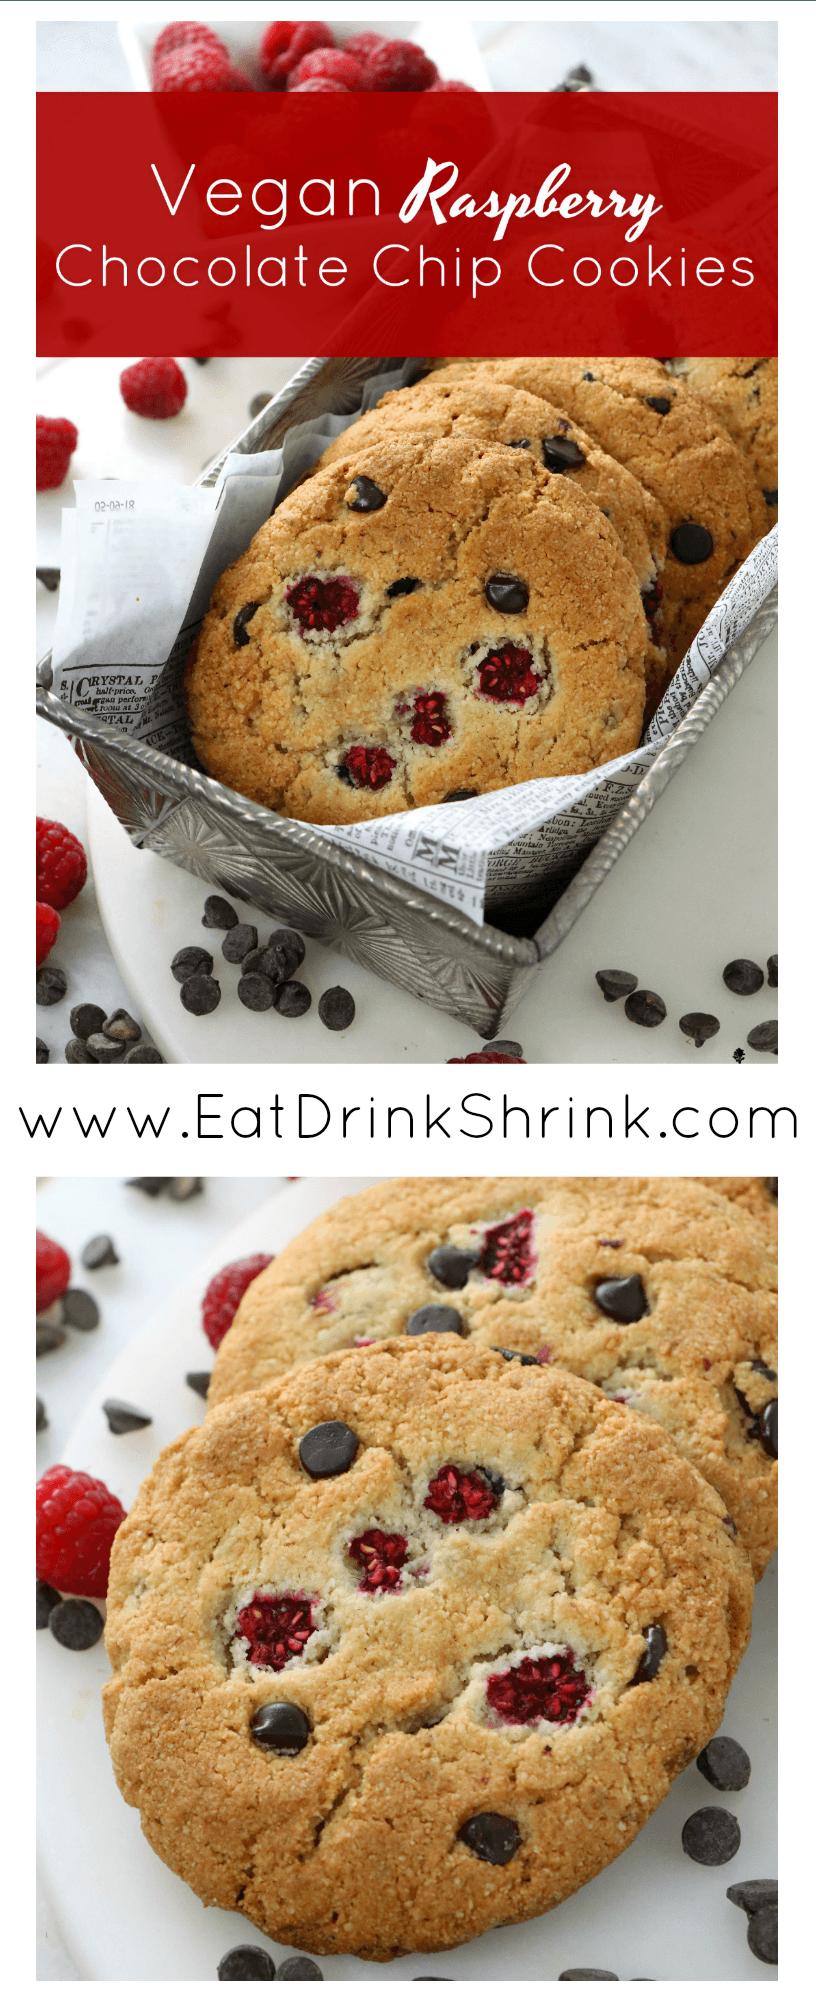 Vegan Almond Flour Raspberry Chocolate Chip Cookies